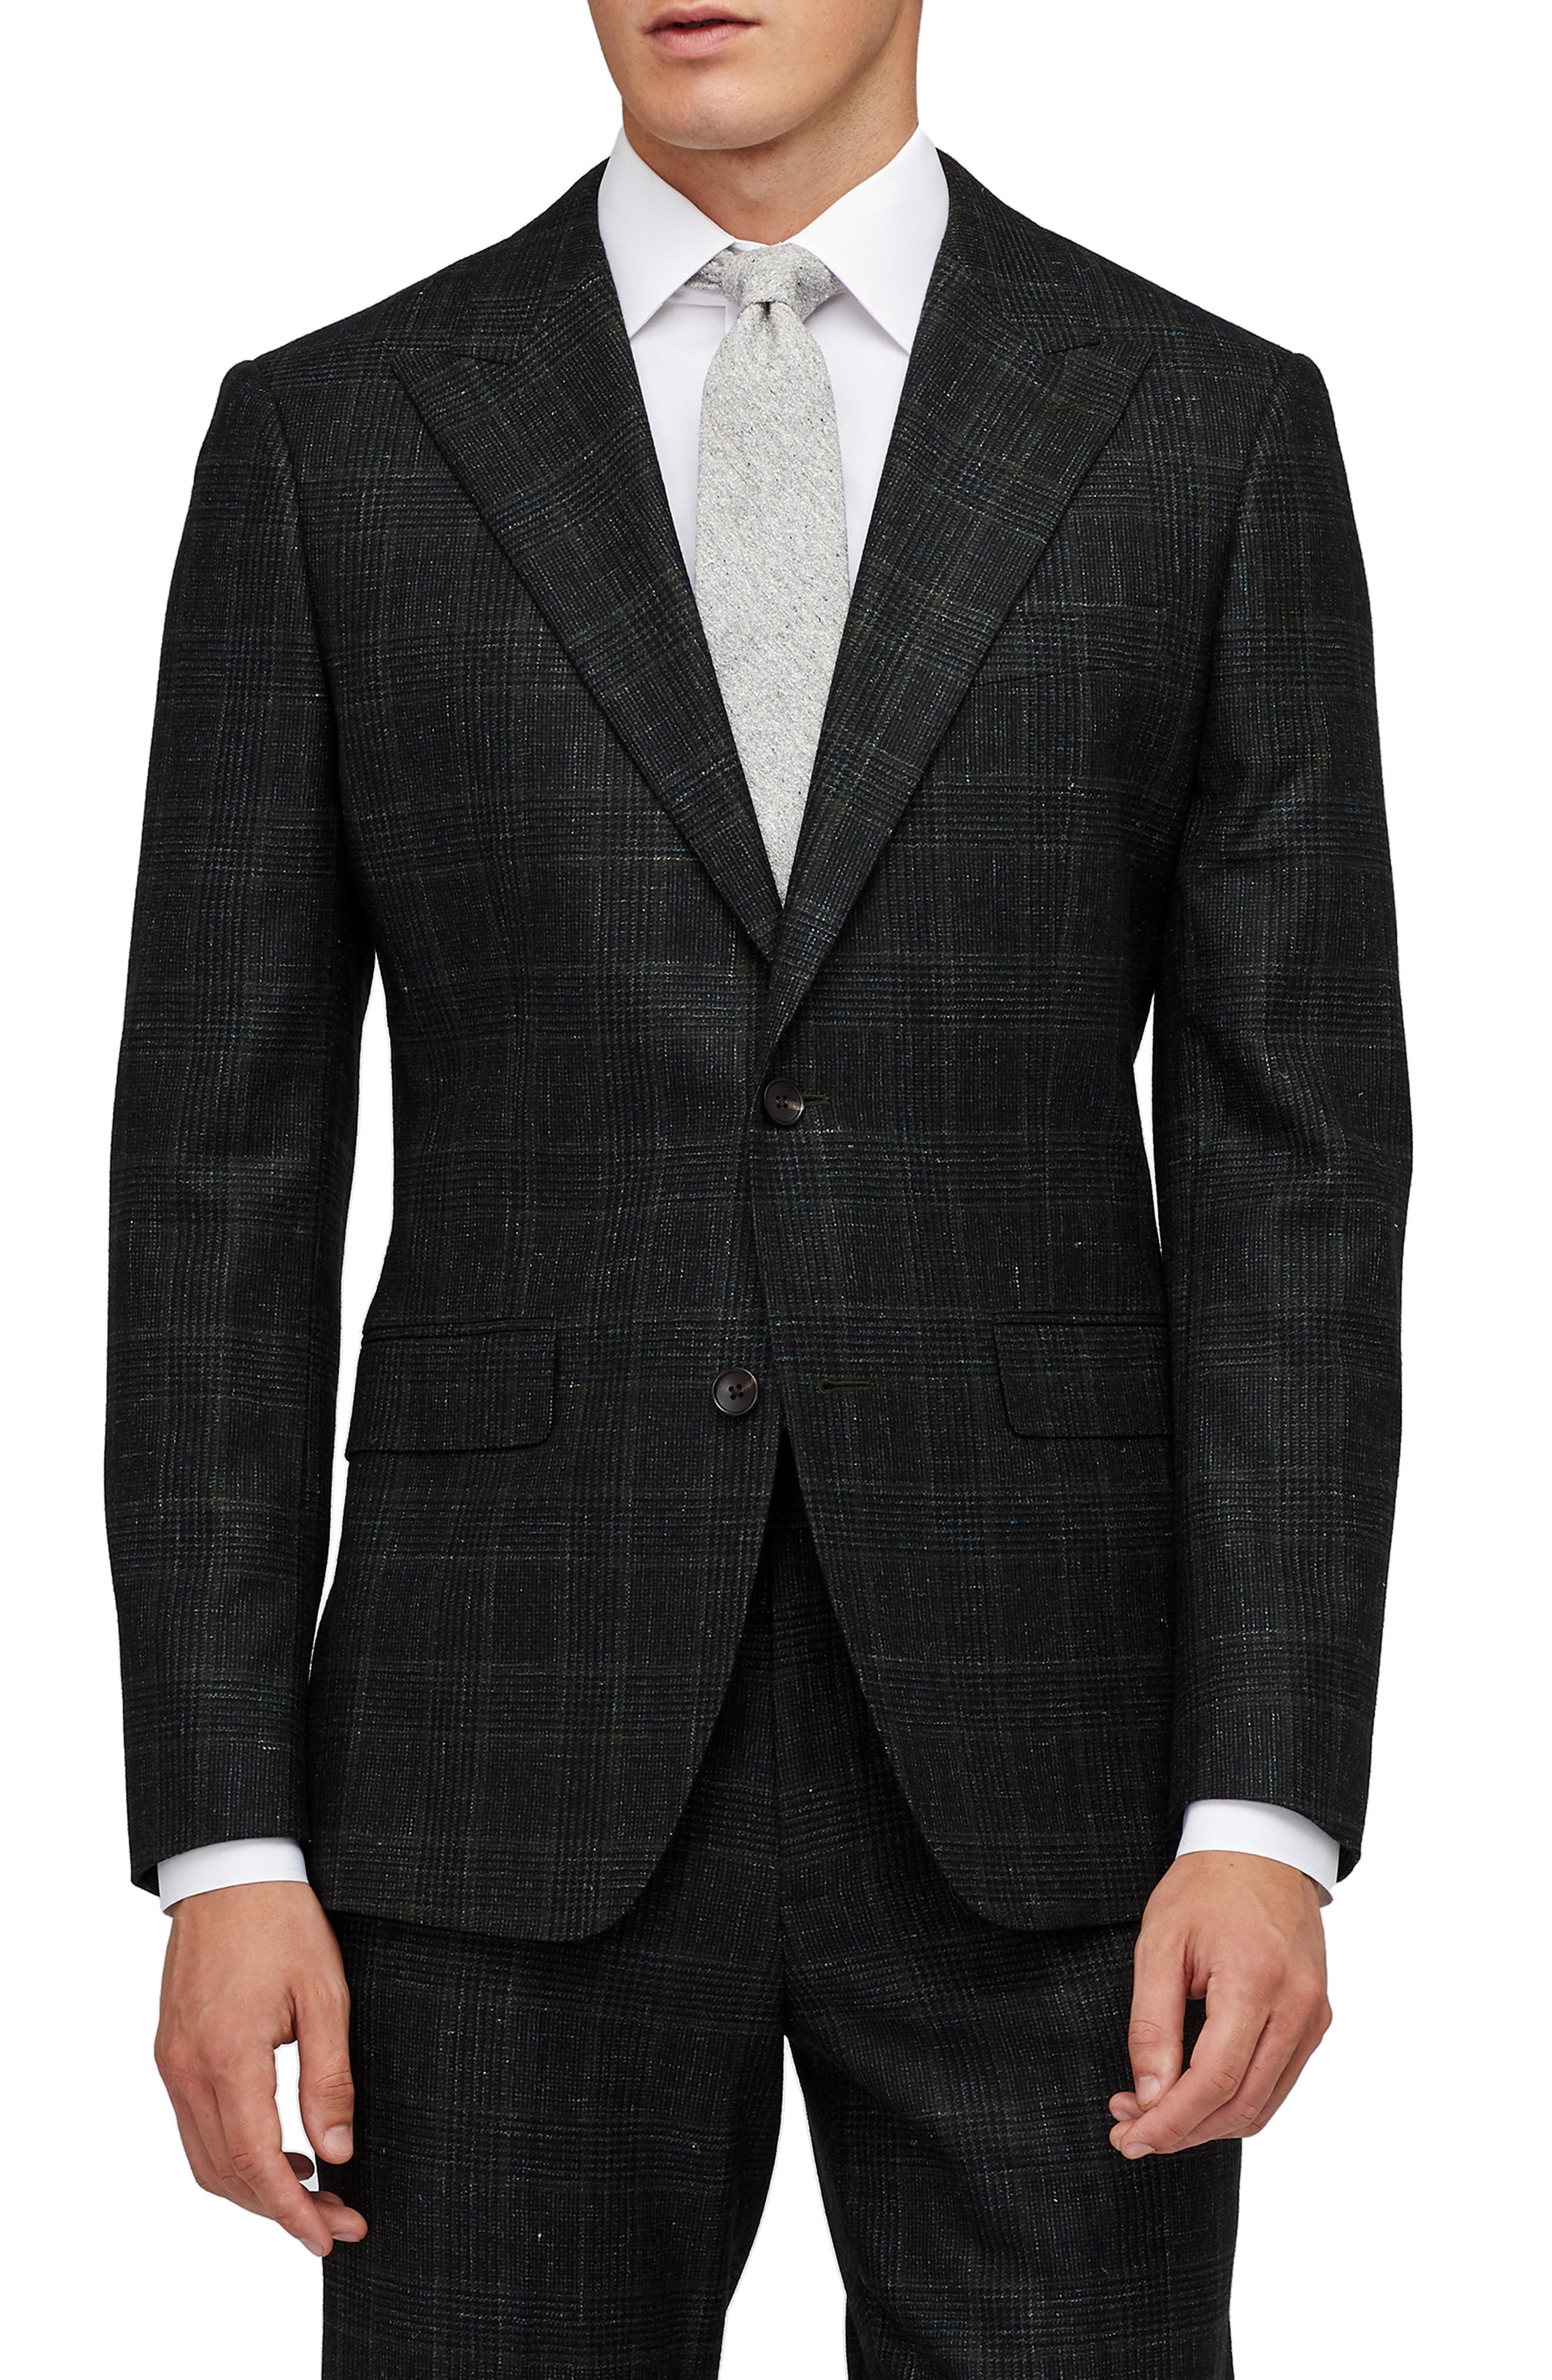 Premium Slim Fit Glen Plaid Wool & Linen Sport Coat,                             Main thumbnail 1, color,                             HAYDEN GREEN GLENPLAID